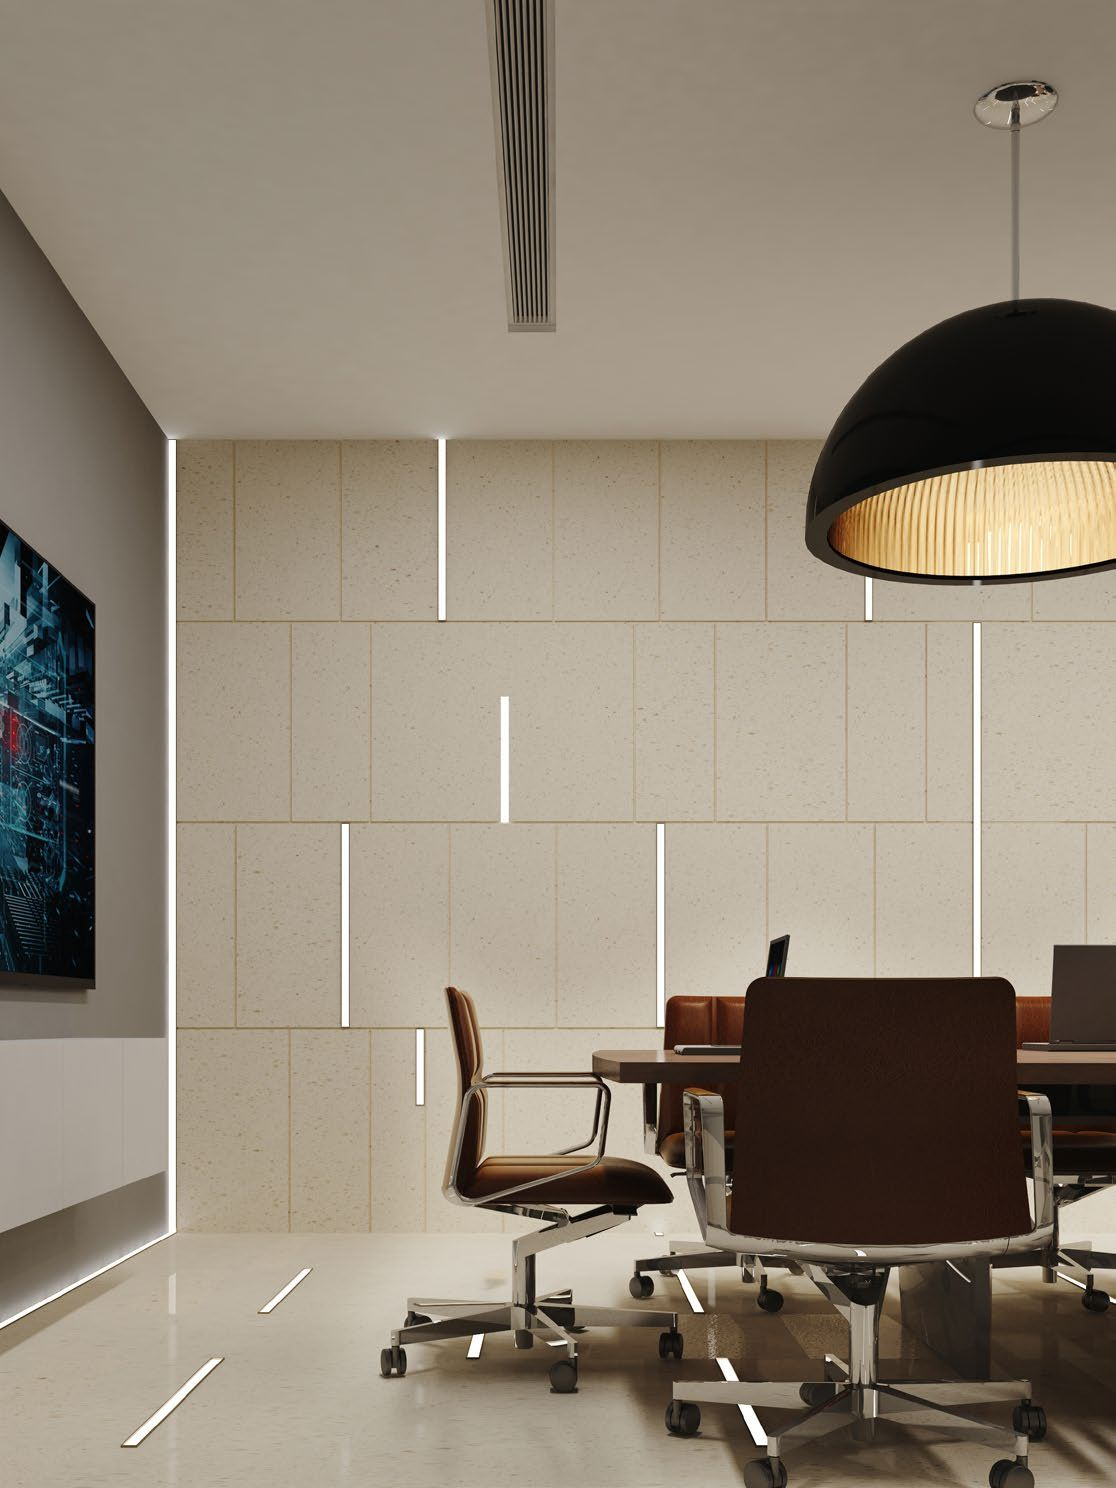 Minimalist design  office ideas office lighting  wall